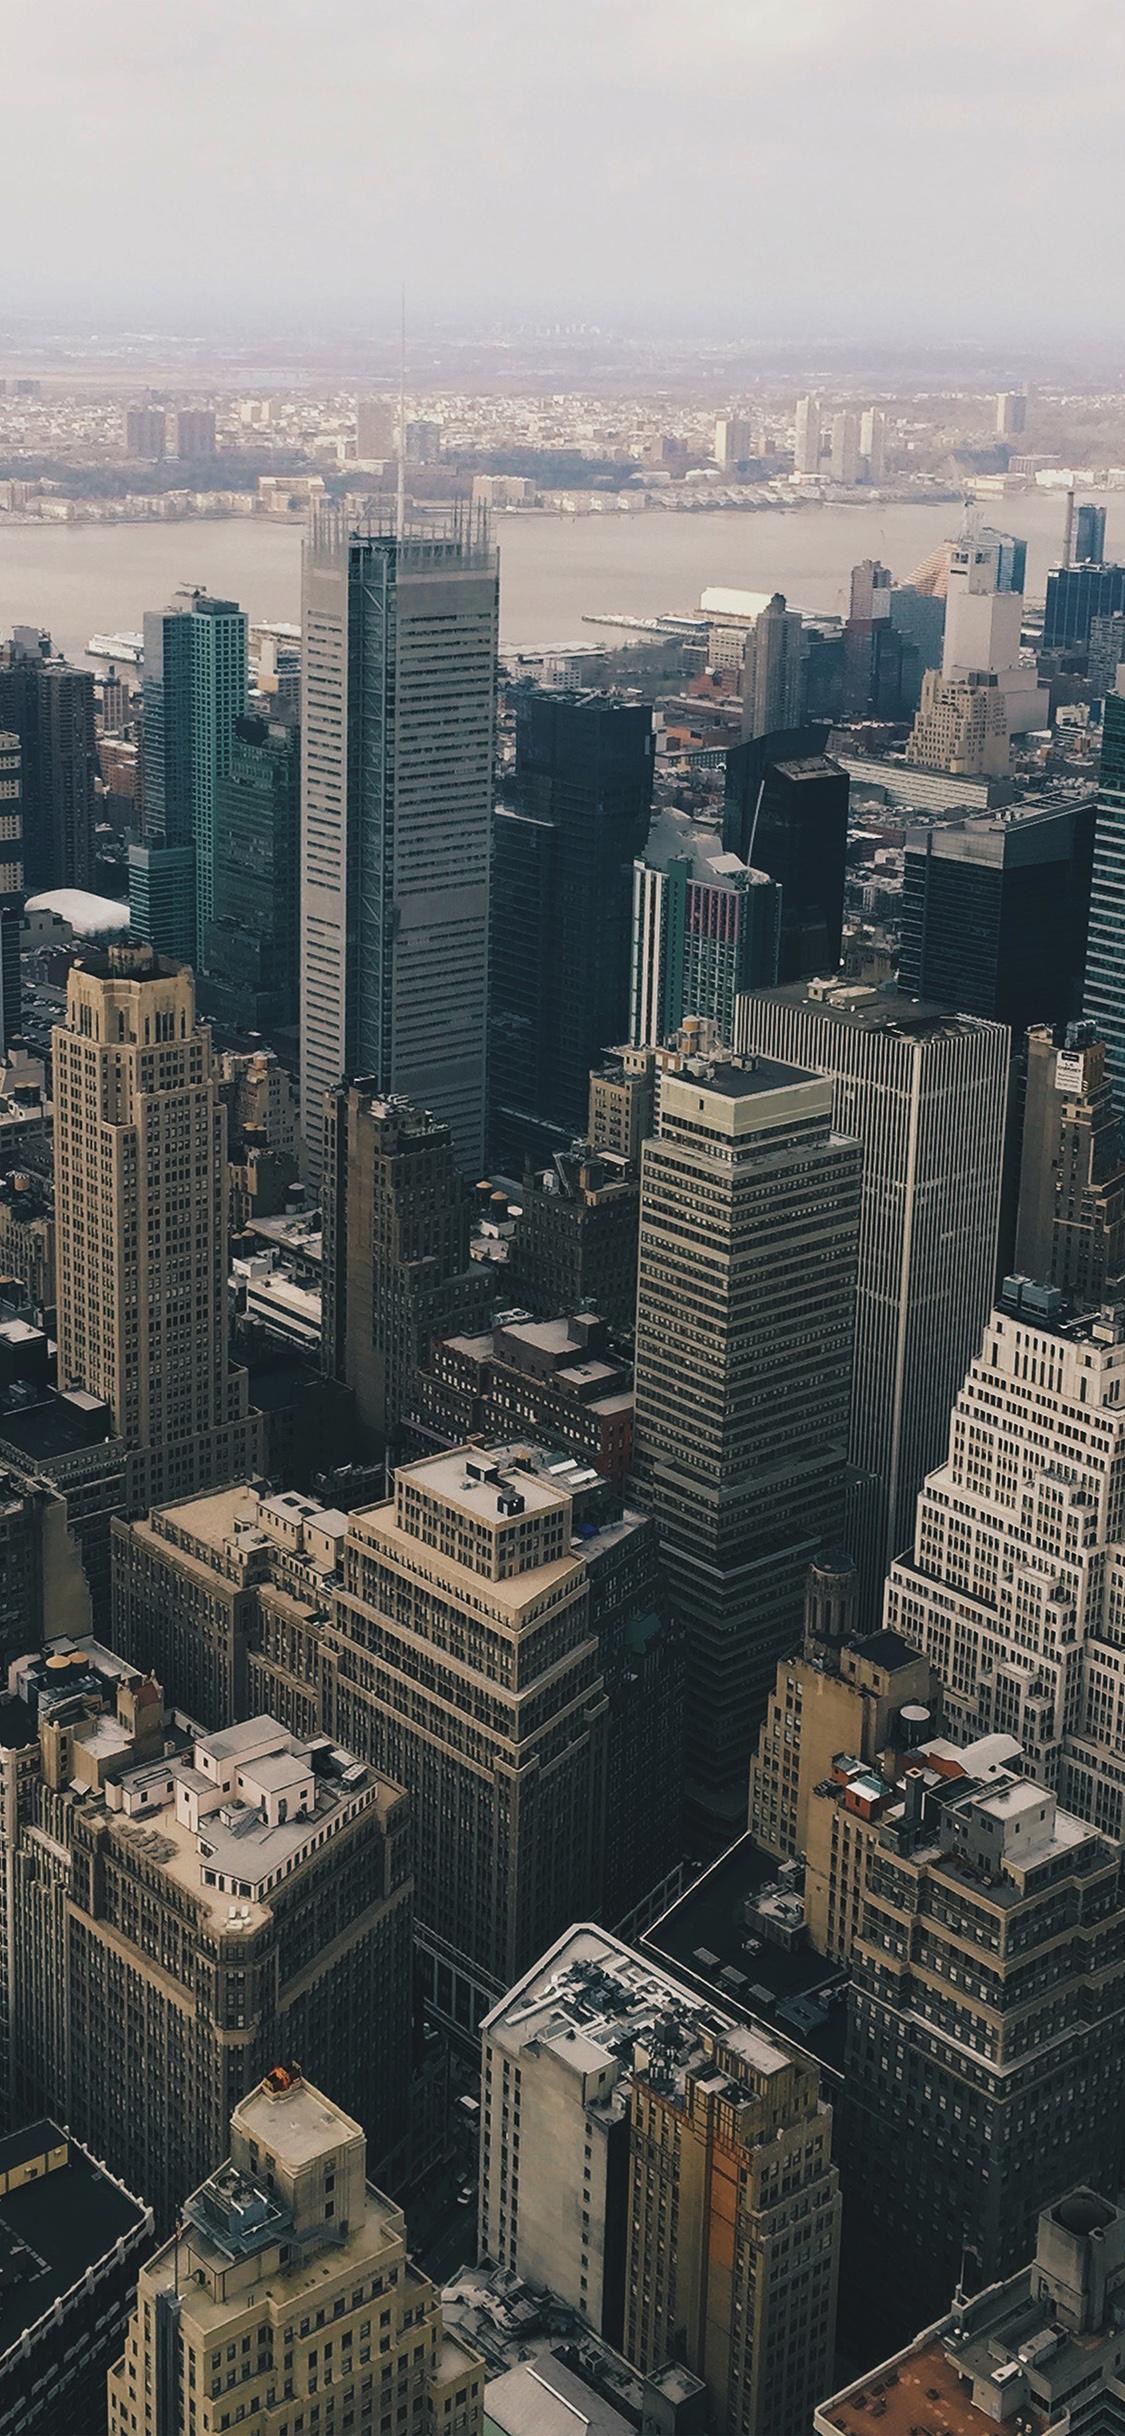 Iphonexpapers Com Iphone X Wallpaper Mz13 Cityview Sky Newyork Hm River